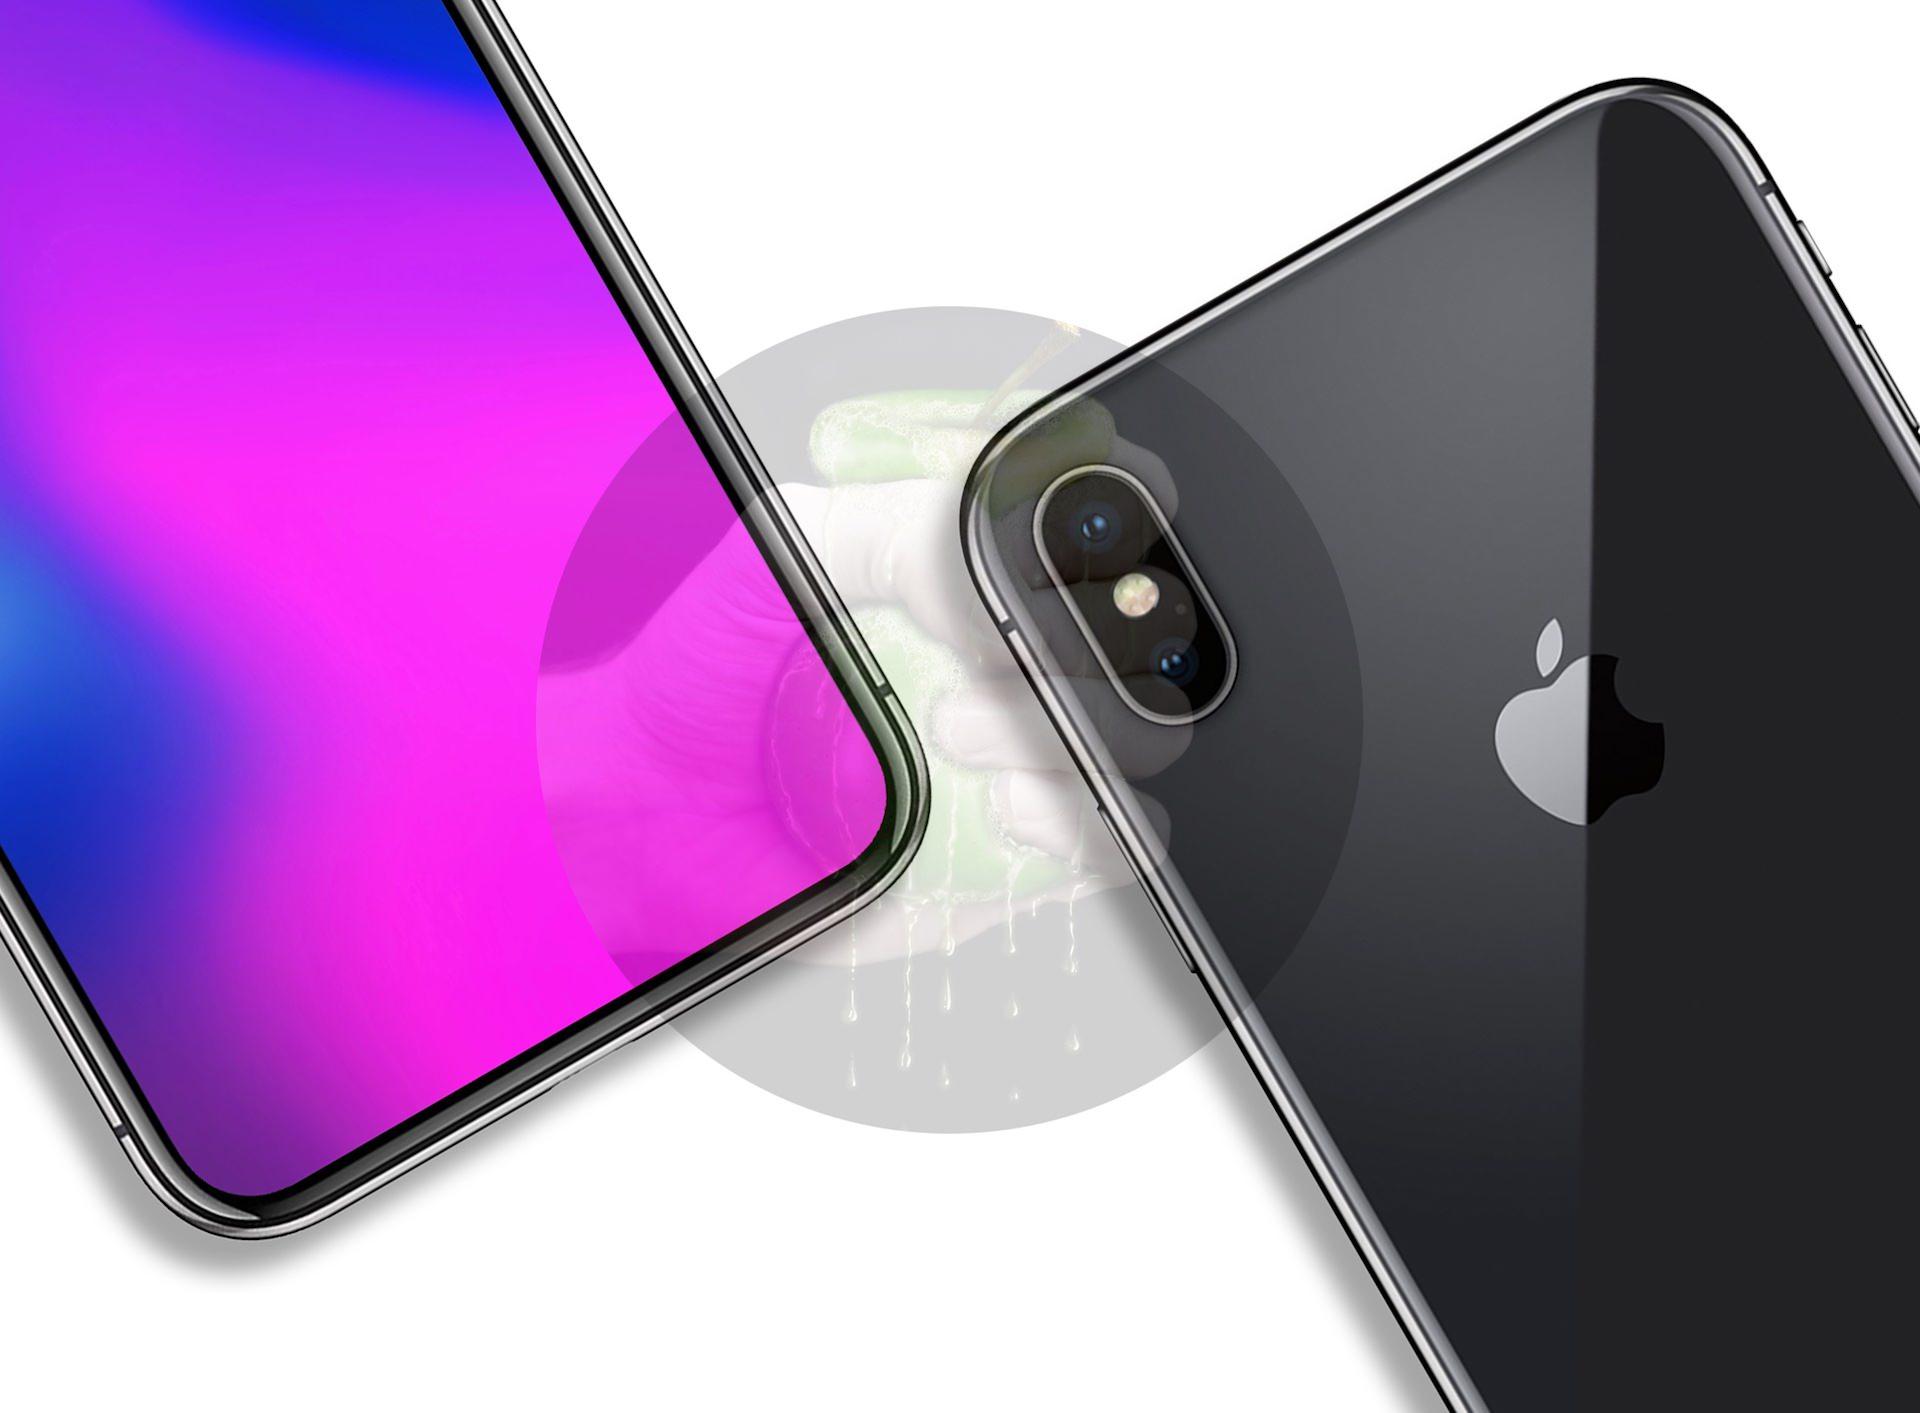 iPhone-9-wylsacom-11.jpg